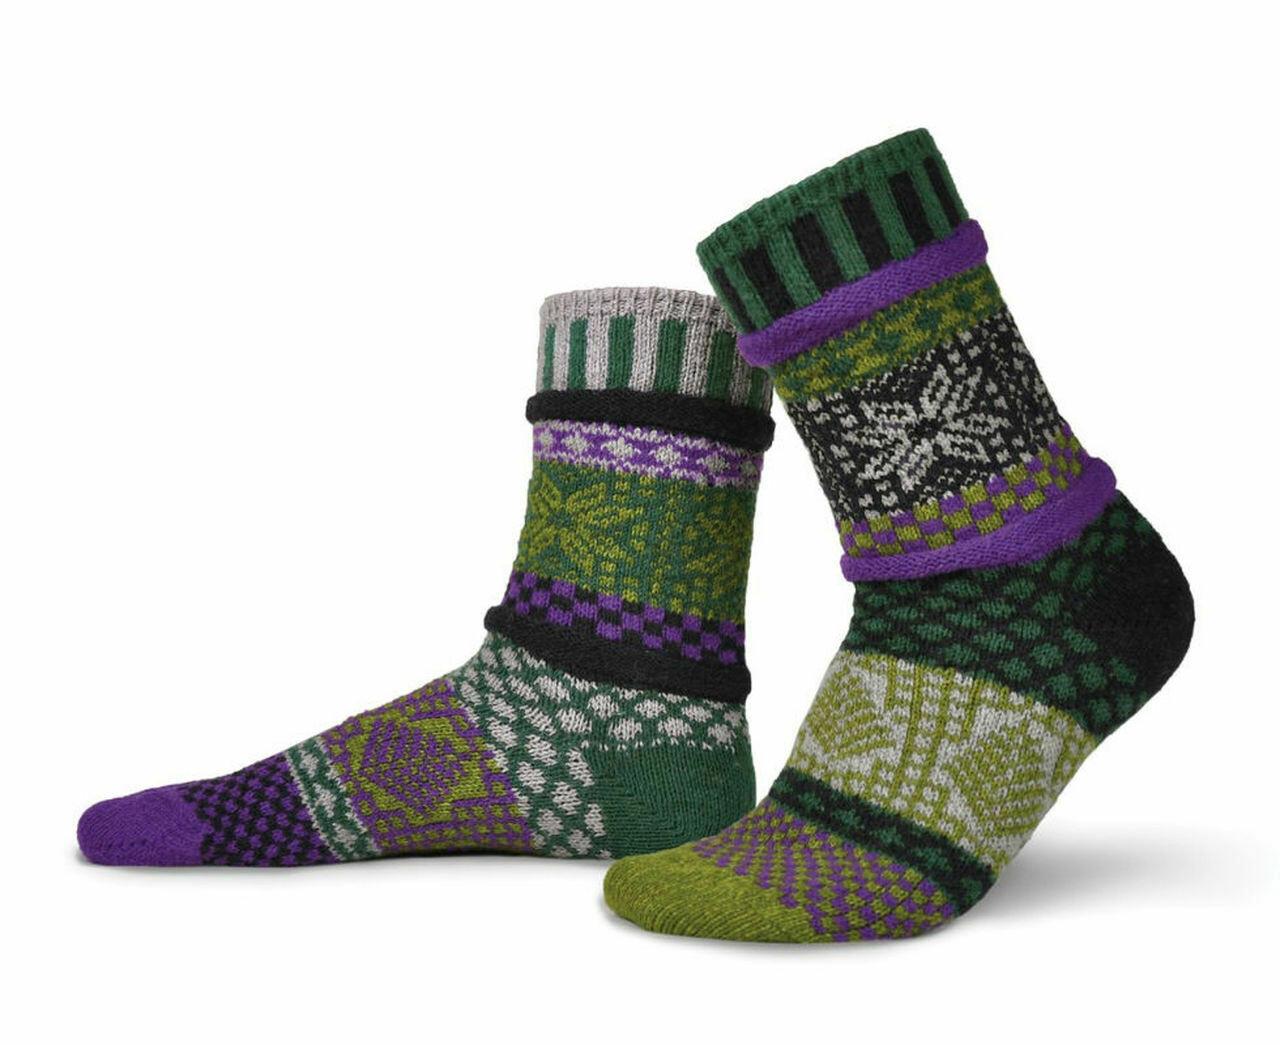 Balsam - Medium - Mismatched Crew Socks - Solmate Socks